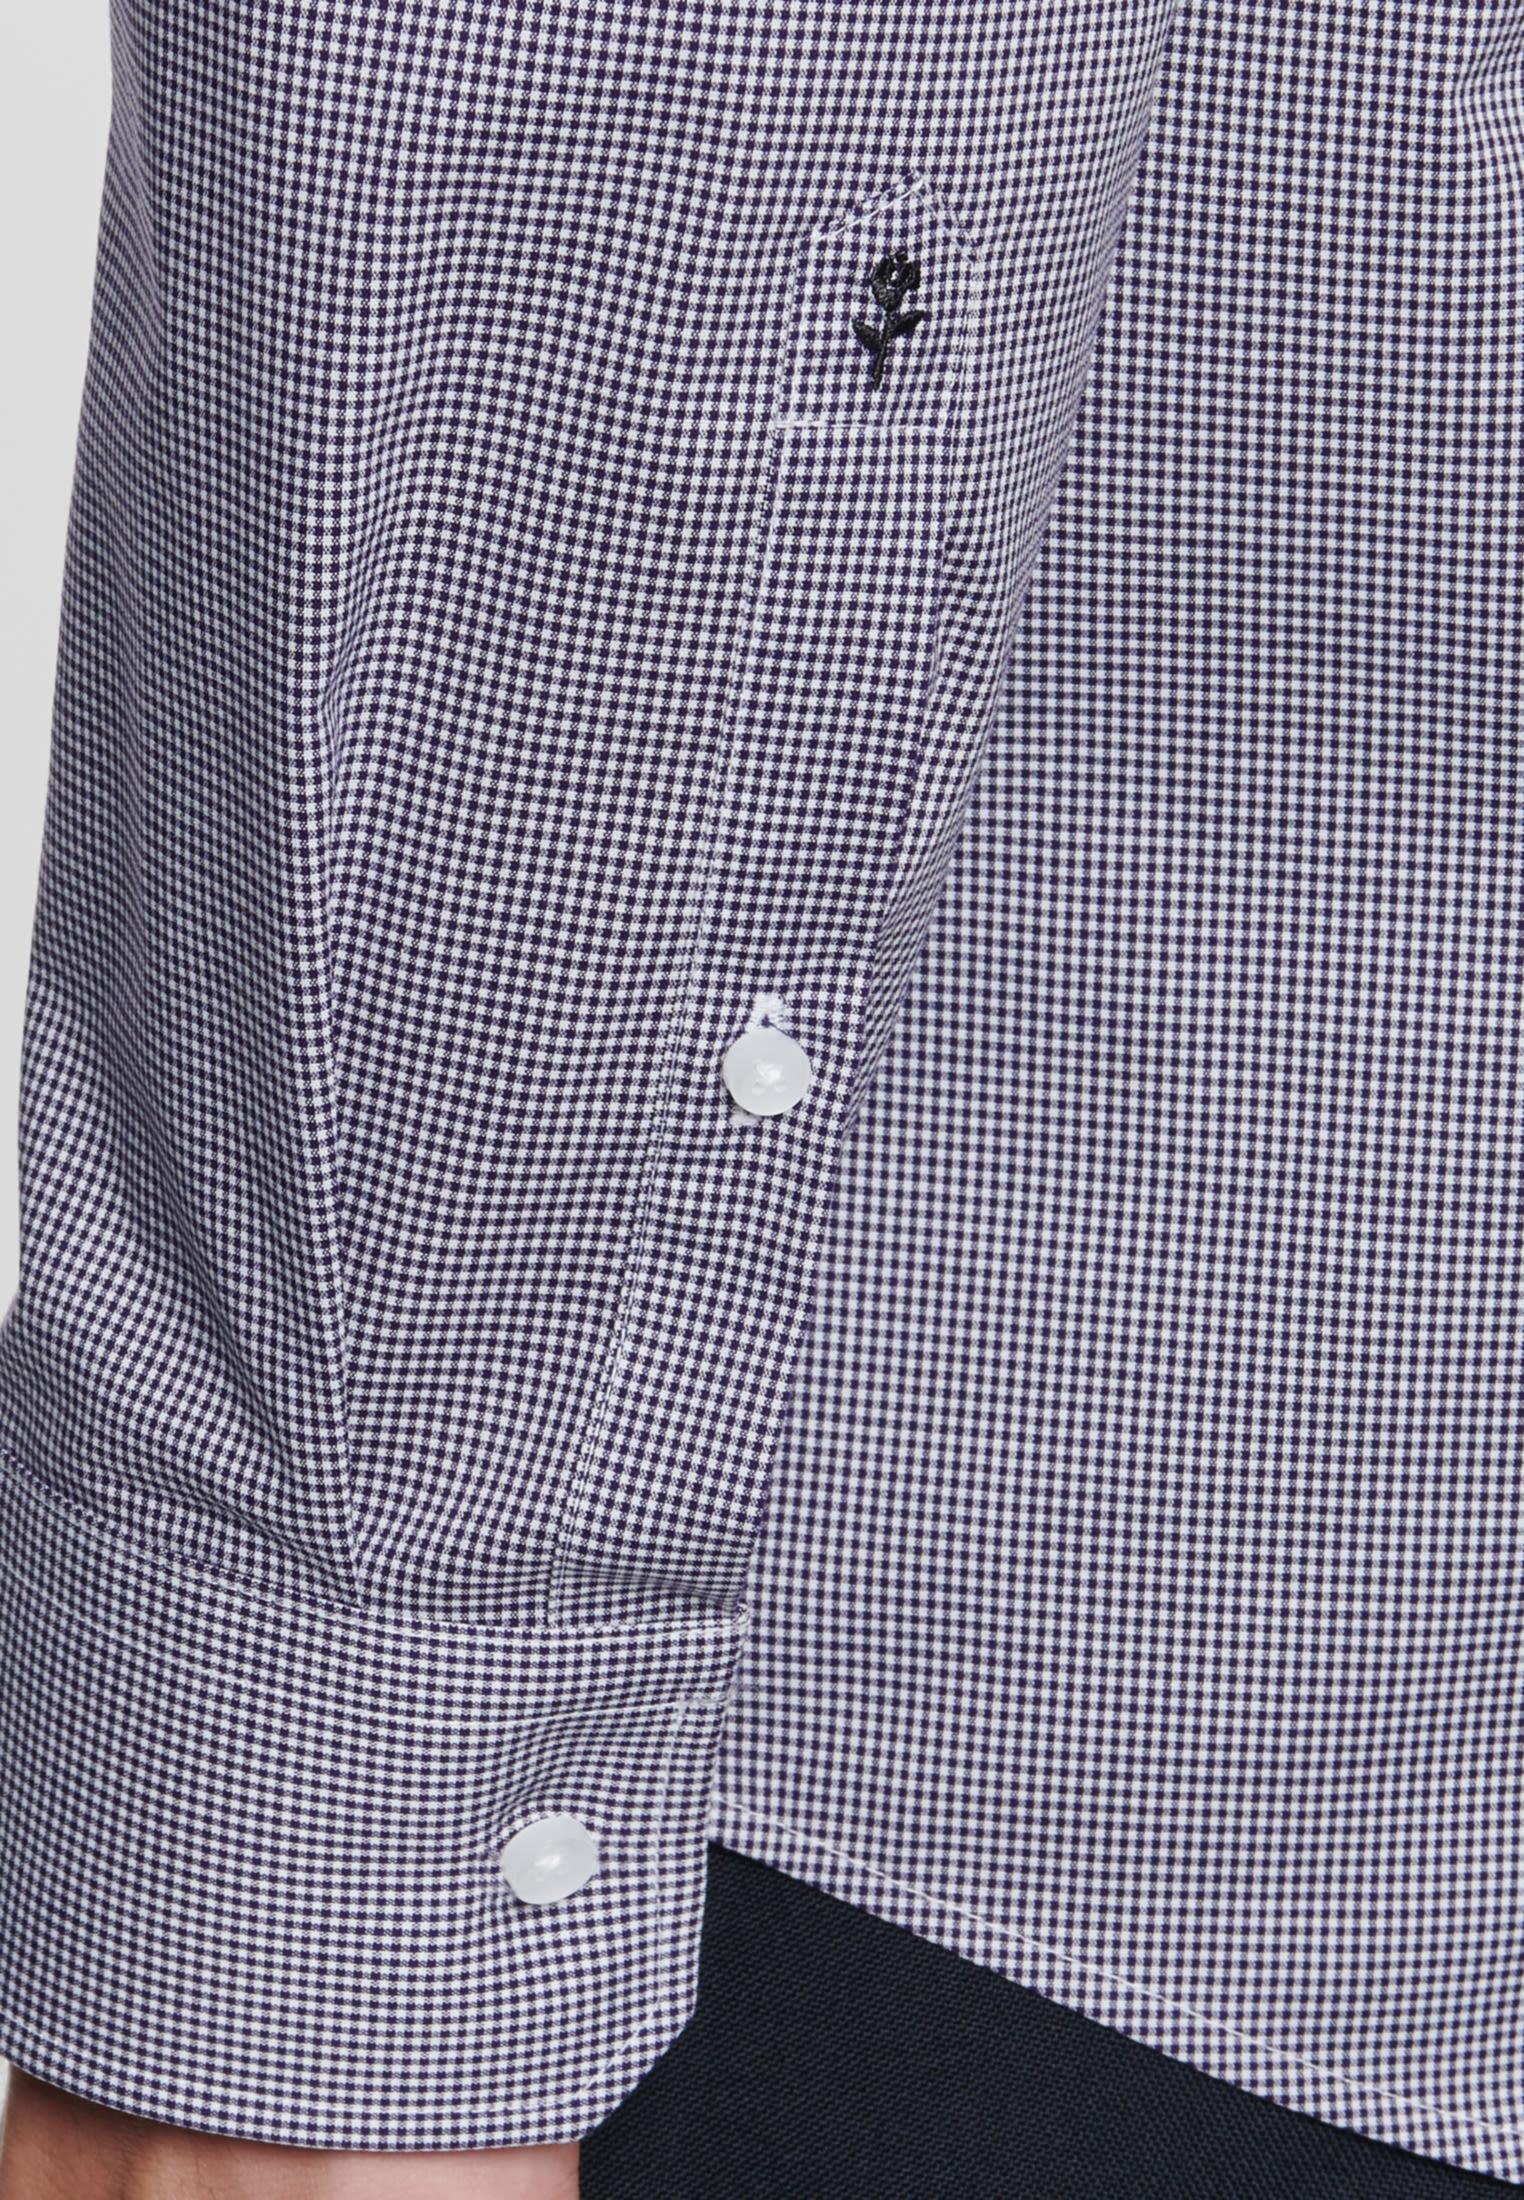 Bügelfreies Popeline Business Hemd in Regular mit Kentkragen in Lila |  Seidensticker Onlineshop